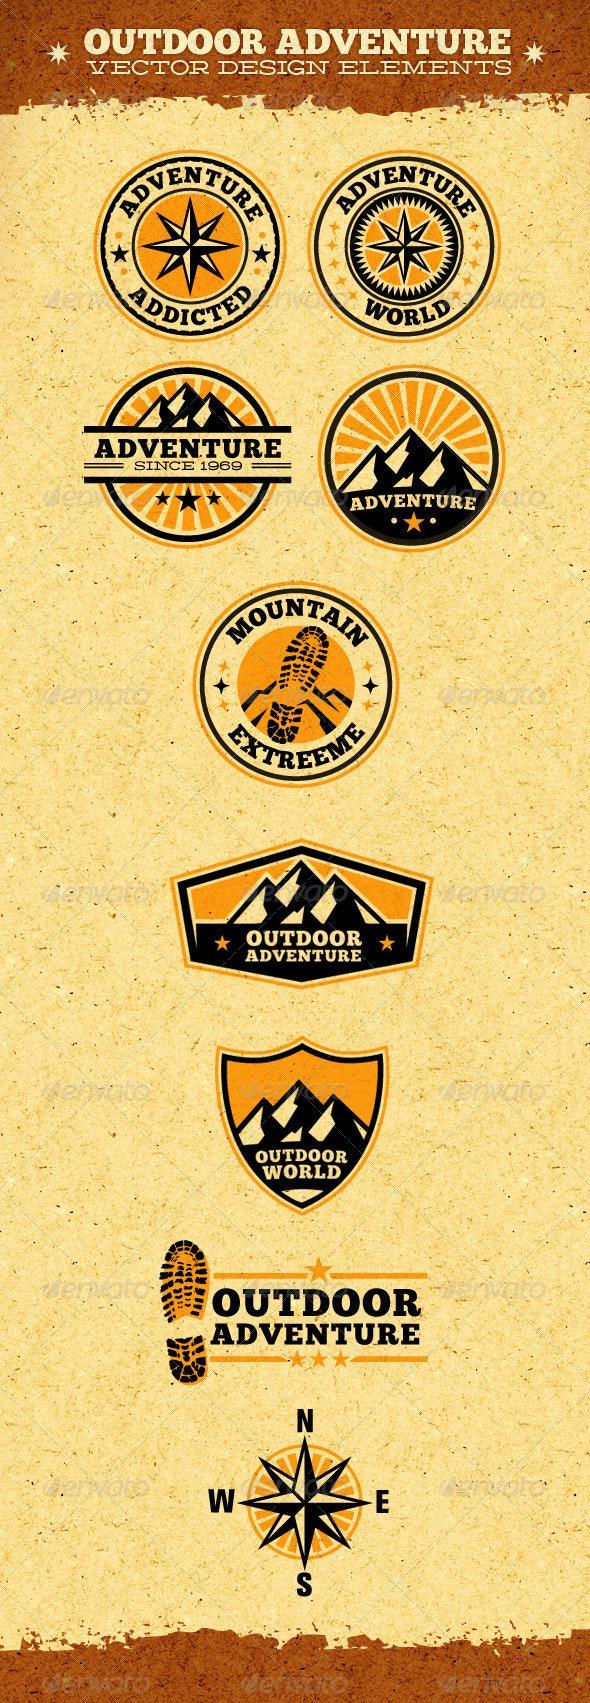 Outdoor Adventure Vector Design Elements - Travel Conceptual